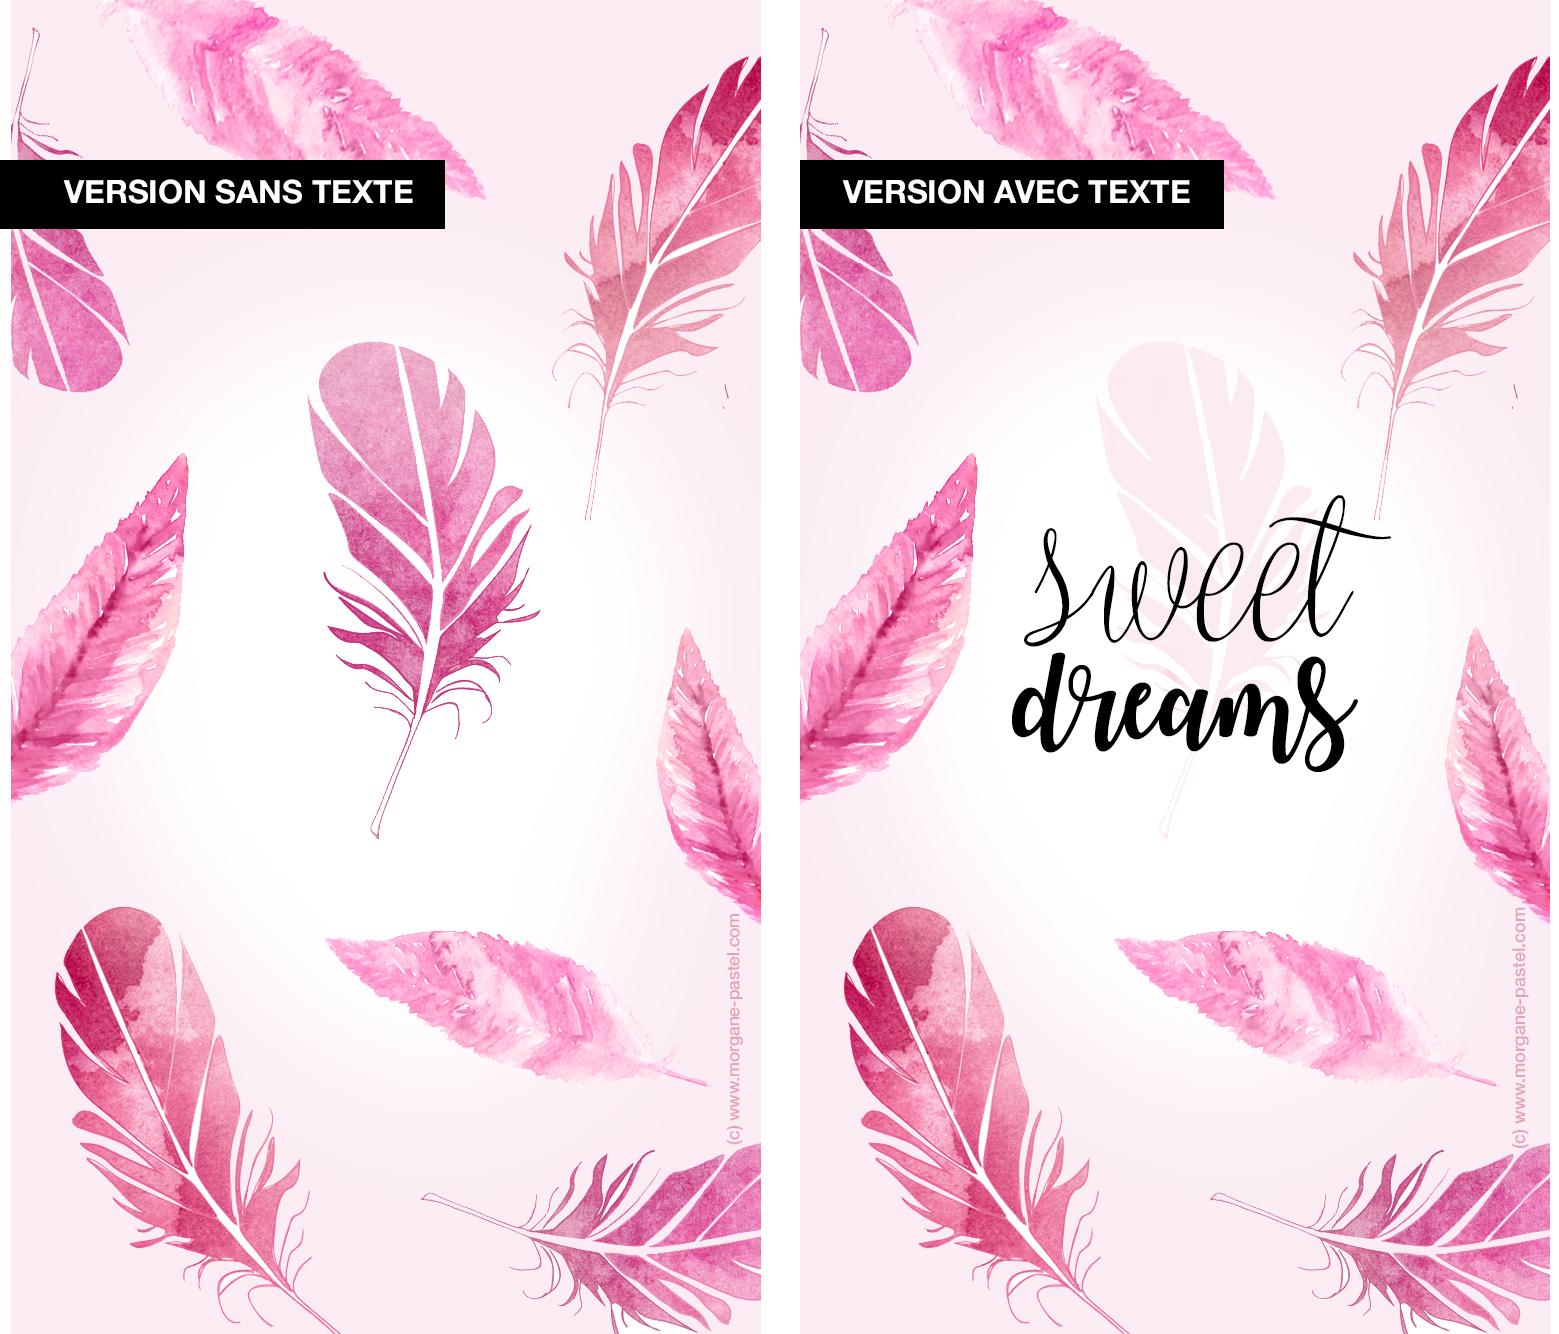 fond ecran gratuit plume violet iphone morgane pastel. Black Bedroom Furniture Sets. Home Design Ideas